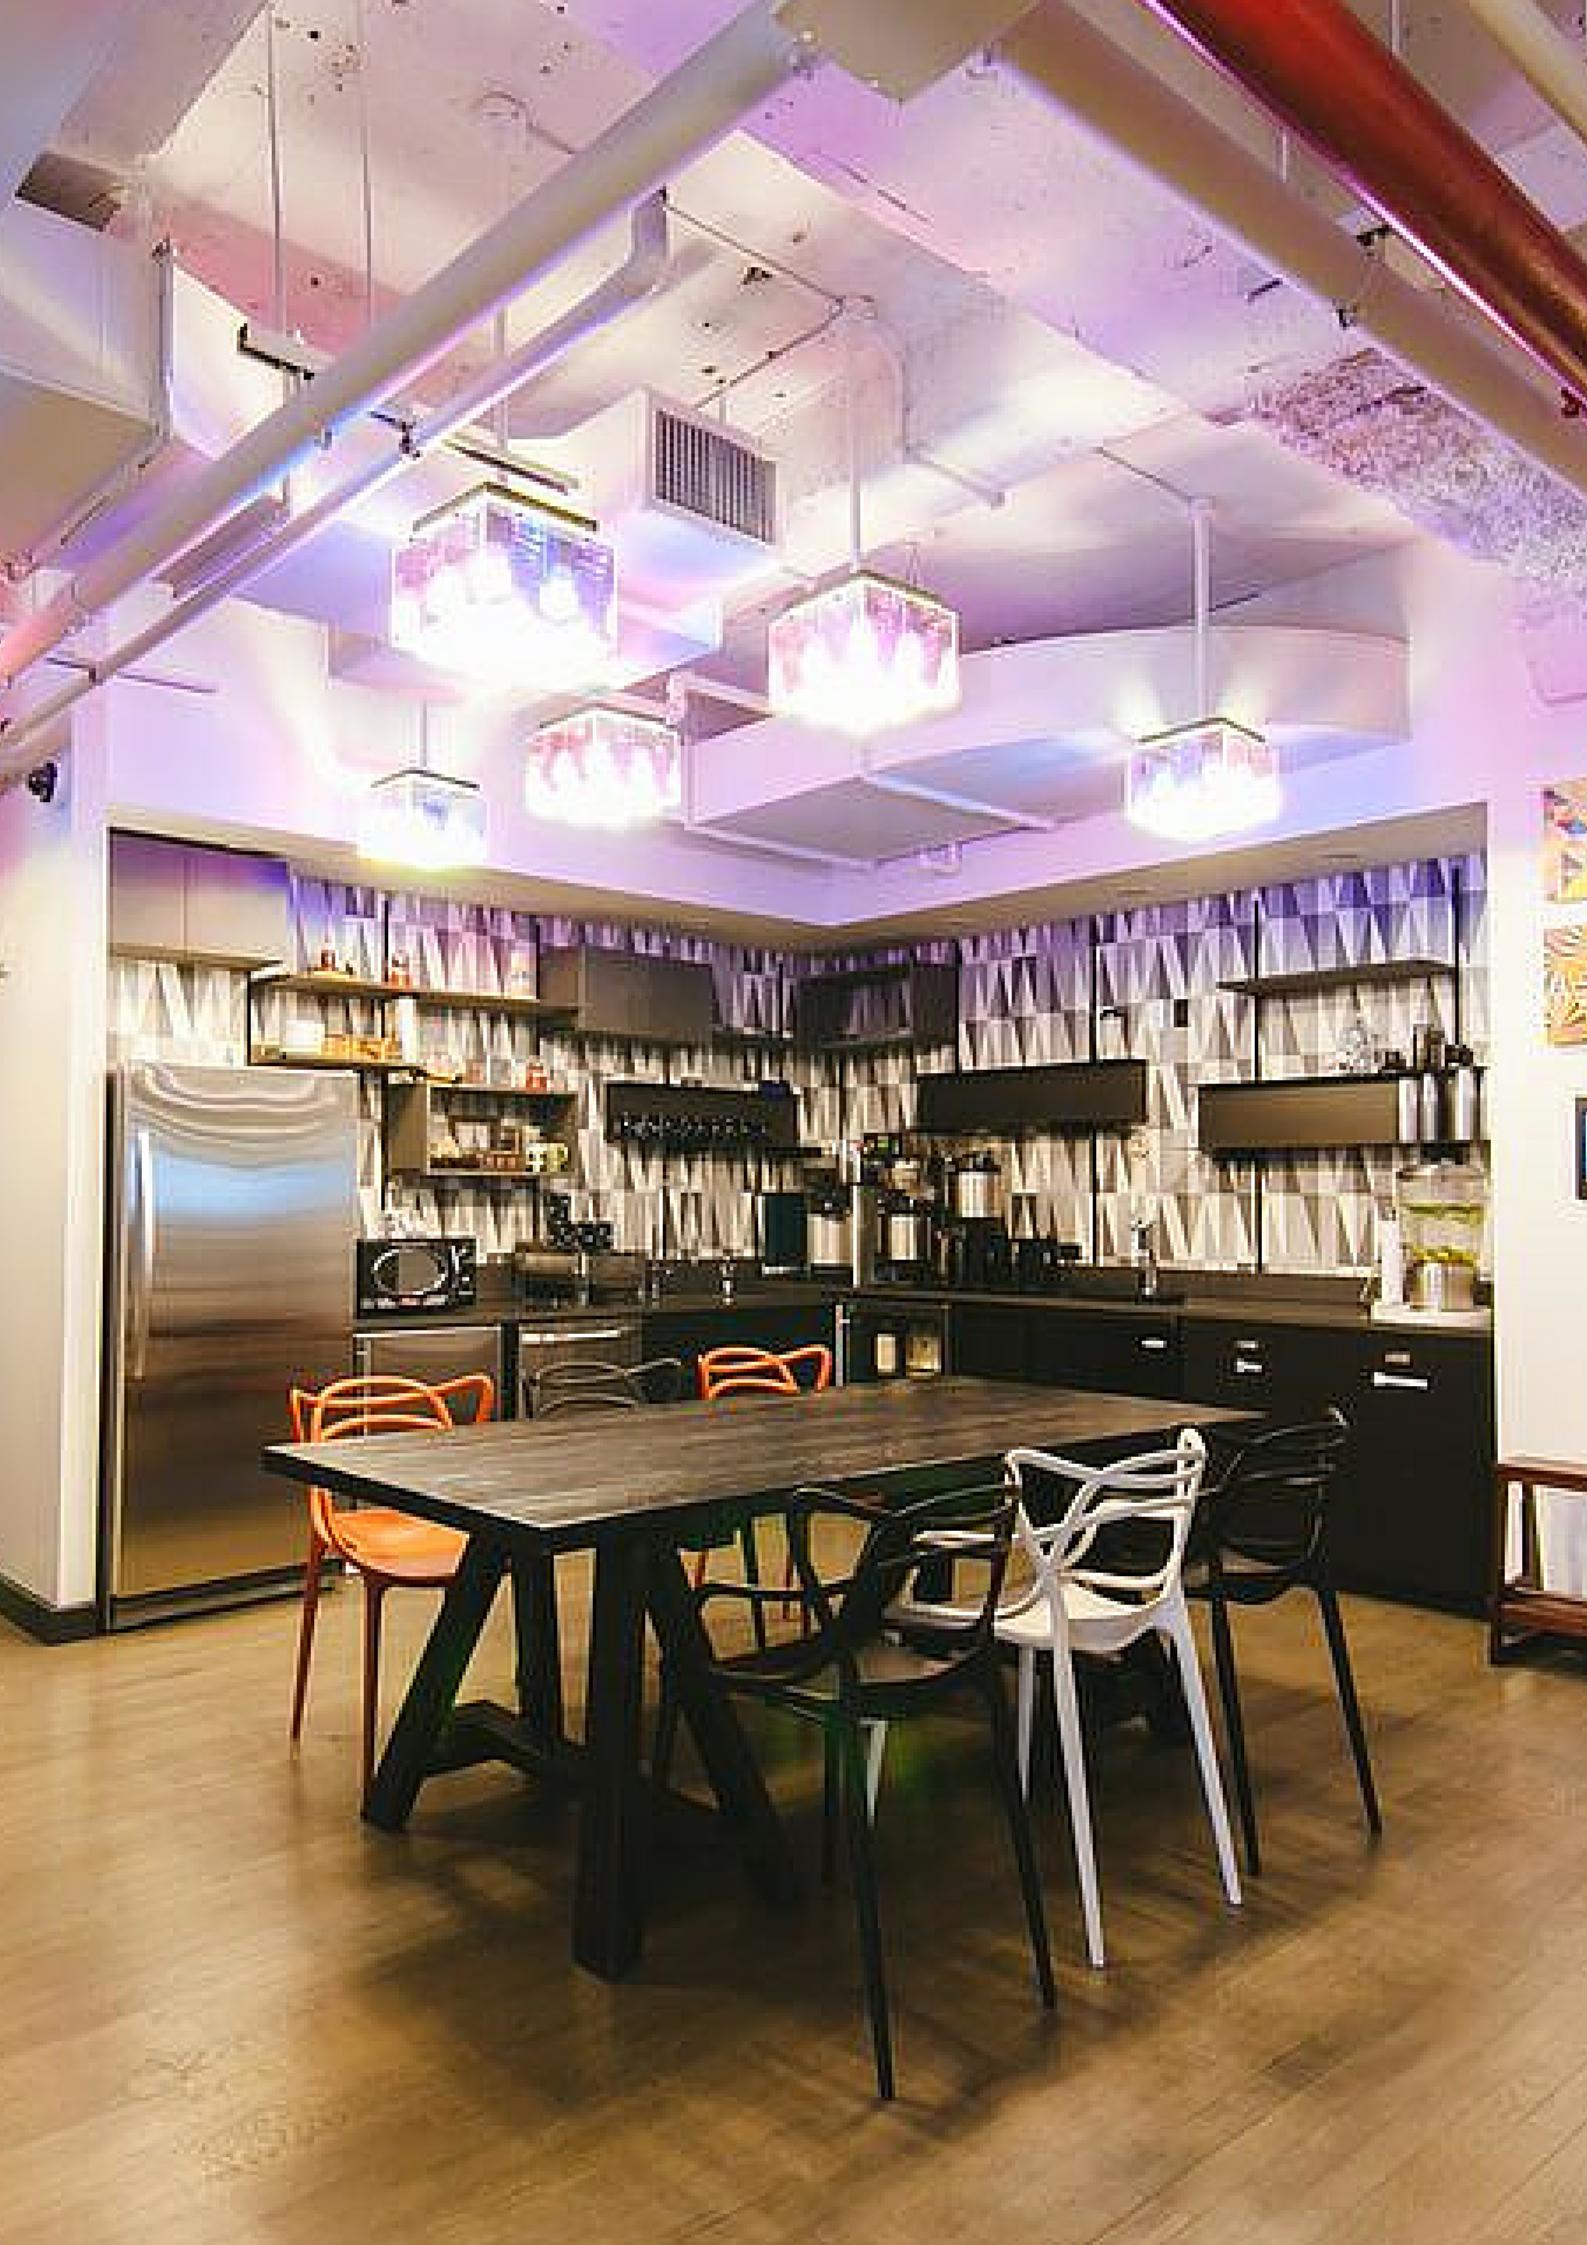 Enjoy A Kitchen Work Space At Wework Fulton Center Kitchen Work Space Work Space Fulton Center